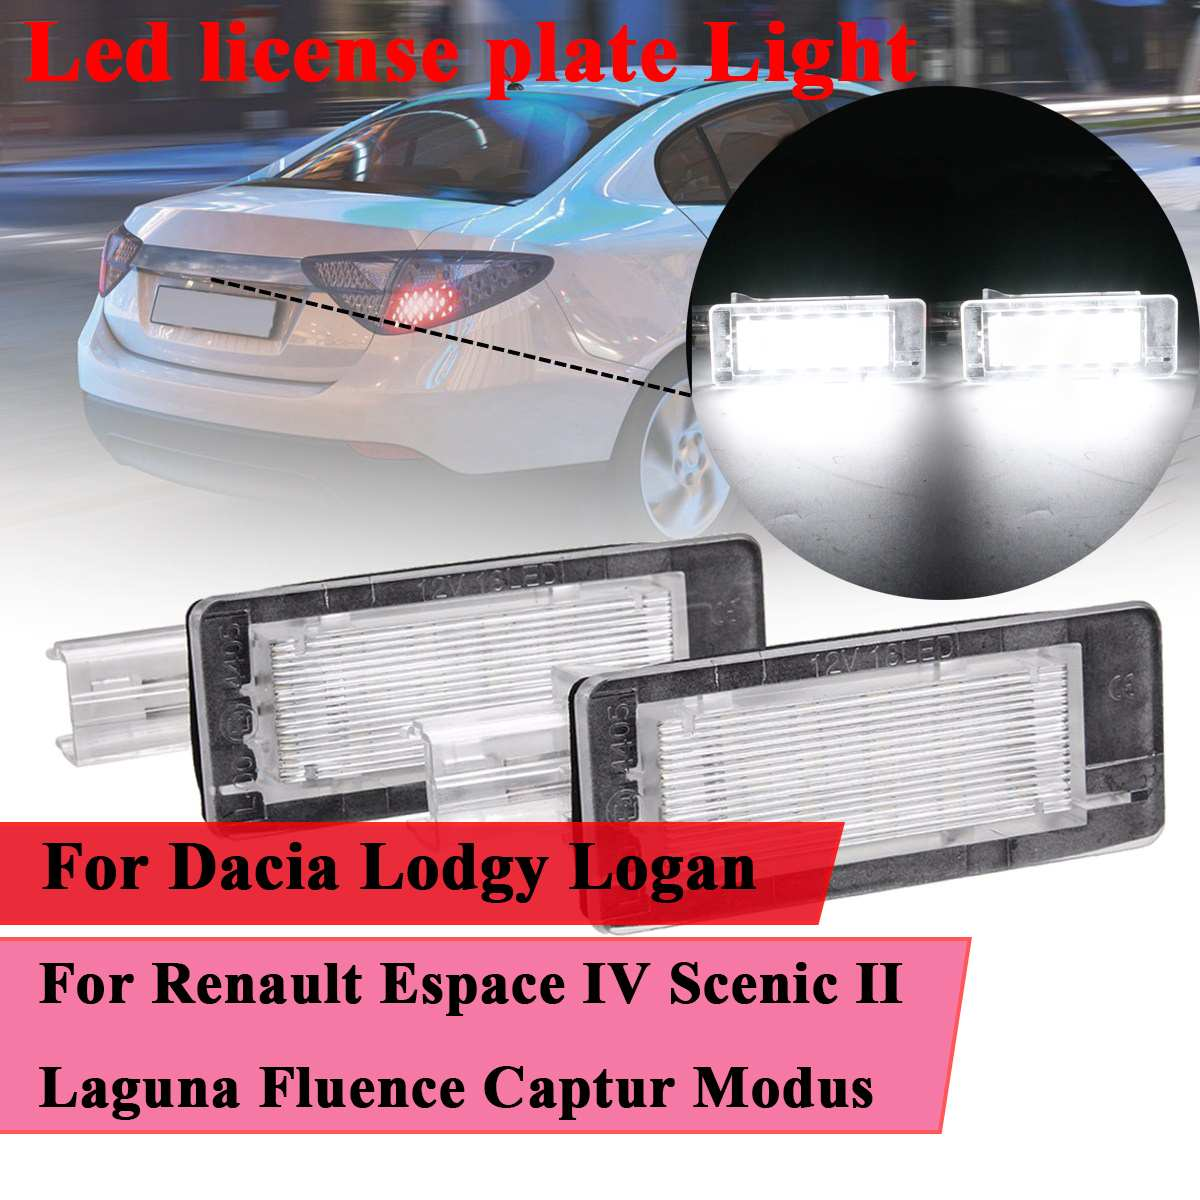 #8200013577 Led para matrícula de coche luz para Renault Espace IV escénica II III Laguna II Fluence Captur Modus para Dacia Lodgy Logan